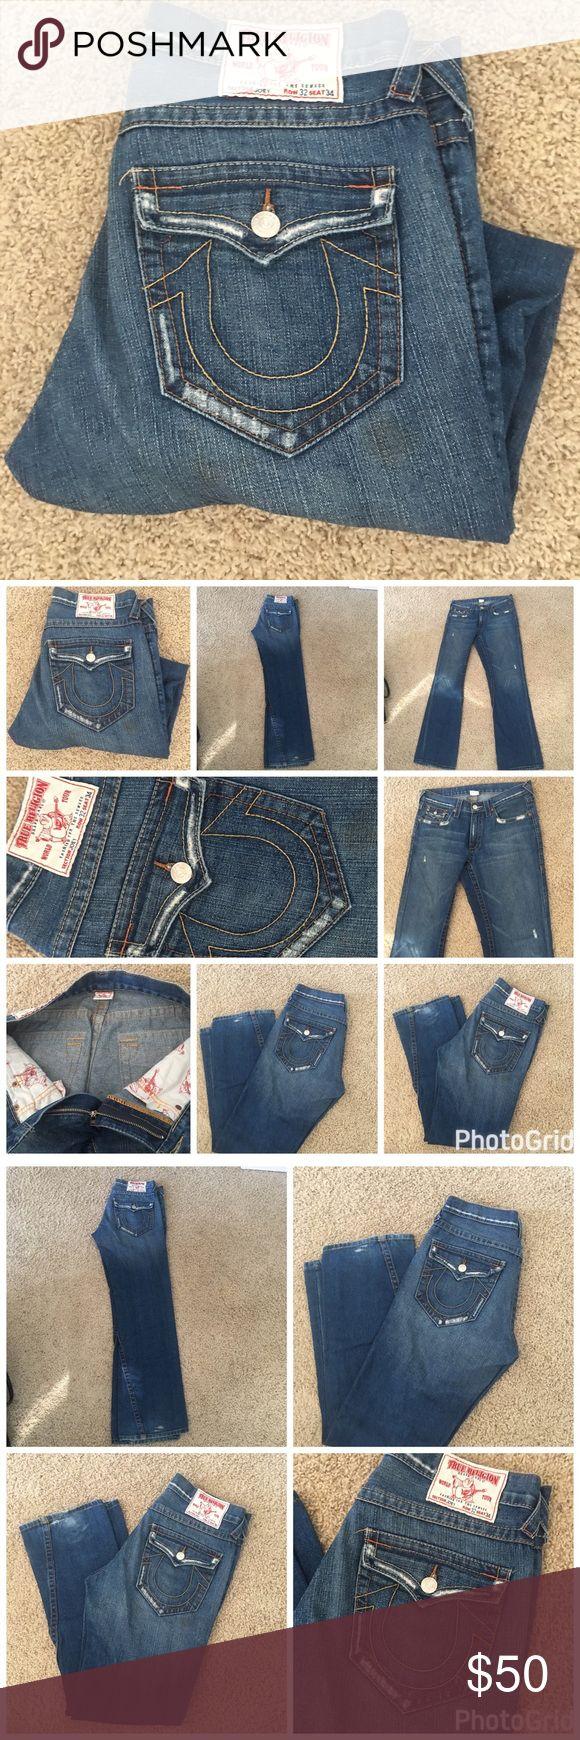 True Religion Men's Joey Jeans True Religion Men's Joey Jeans, good preowned condition. Size 32 inseam 34 True Religion Jeans